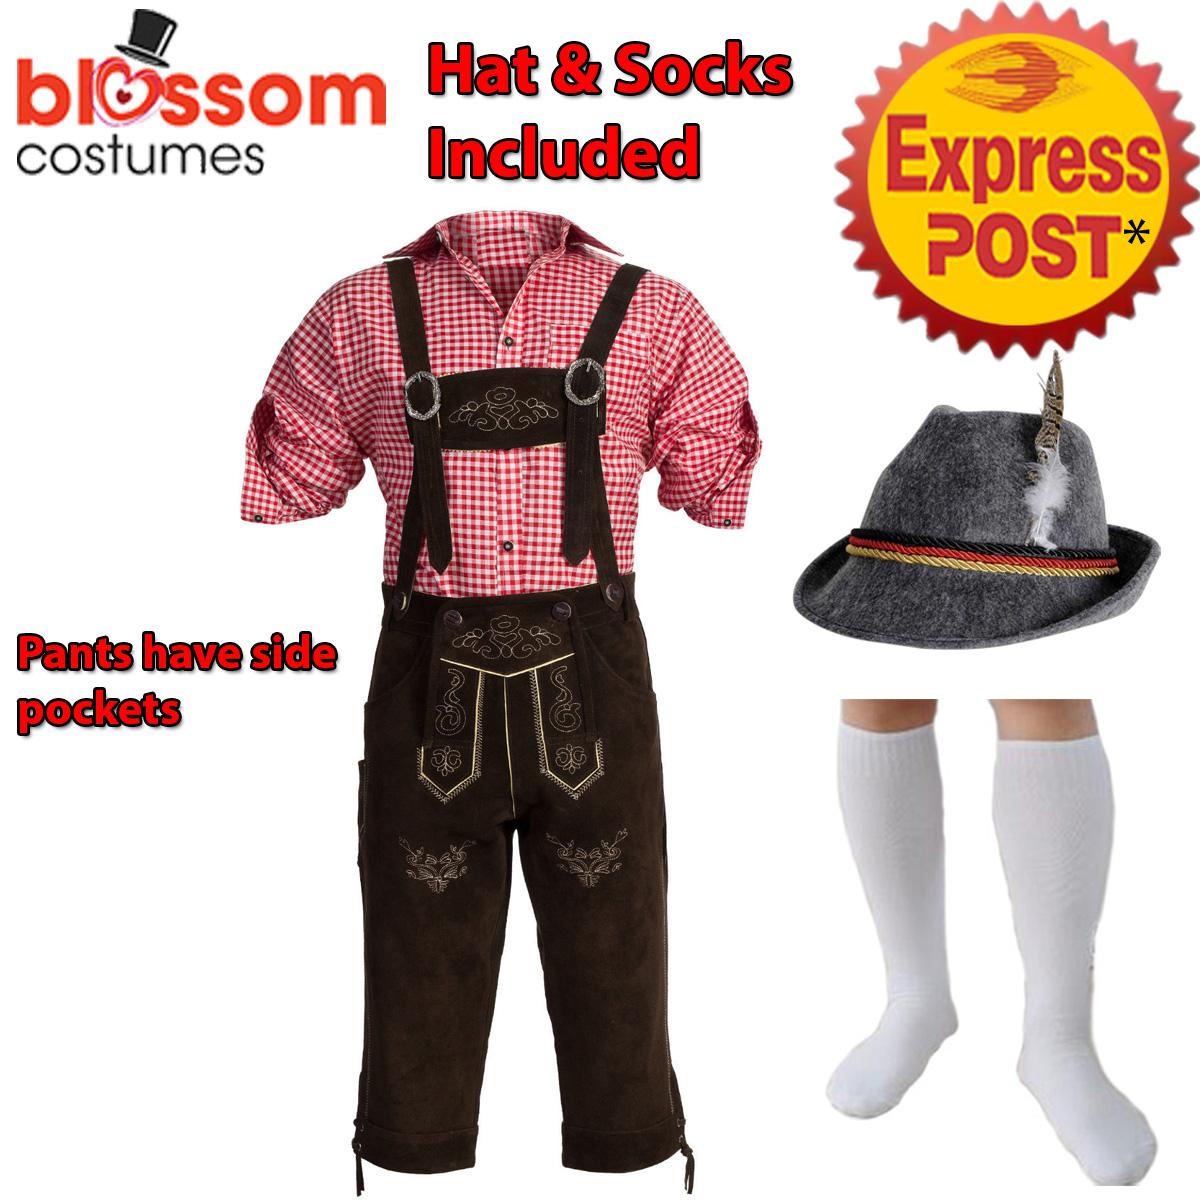 K407-Authentic-Bavarian-Dark-Brown-Suede-Lederhosen-Oktoberfest-Beer-Costume-Hat